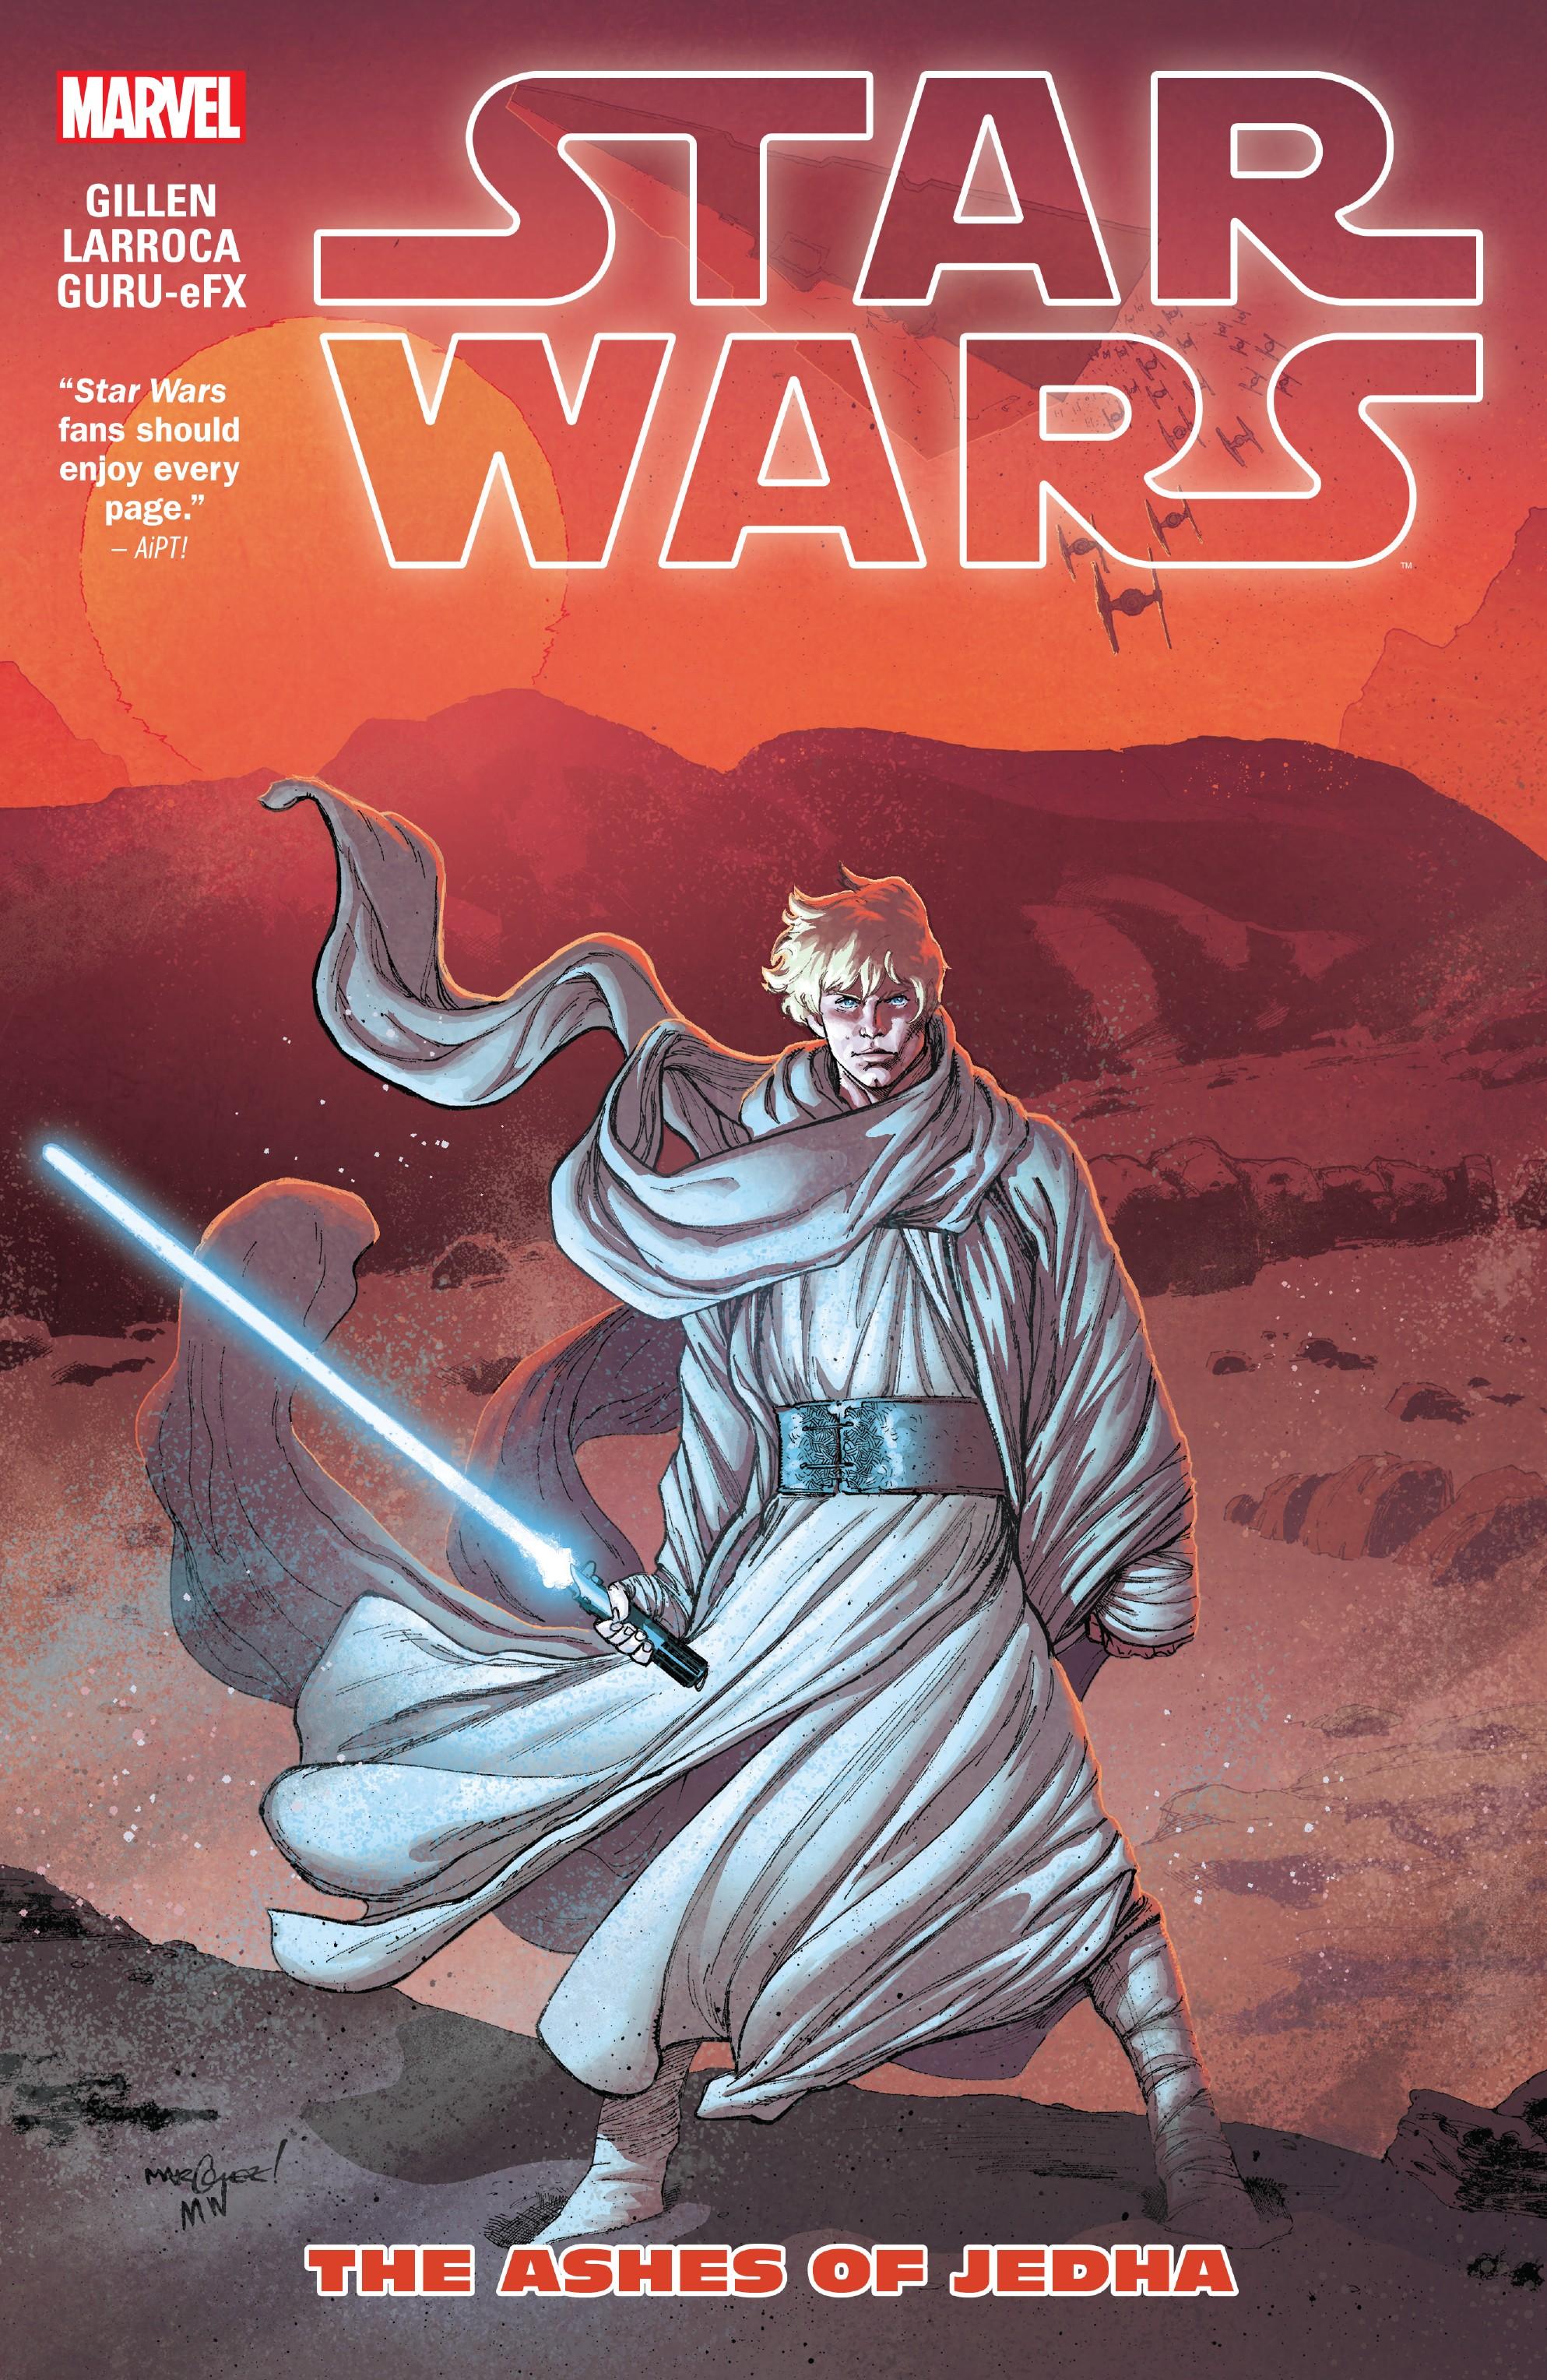 Звёздные войны: Выпуск 7 — Пепел Джеды